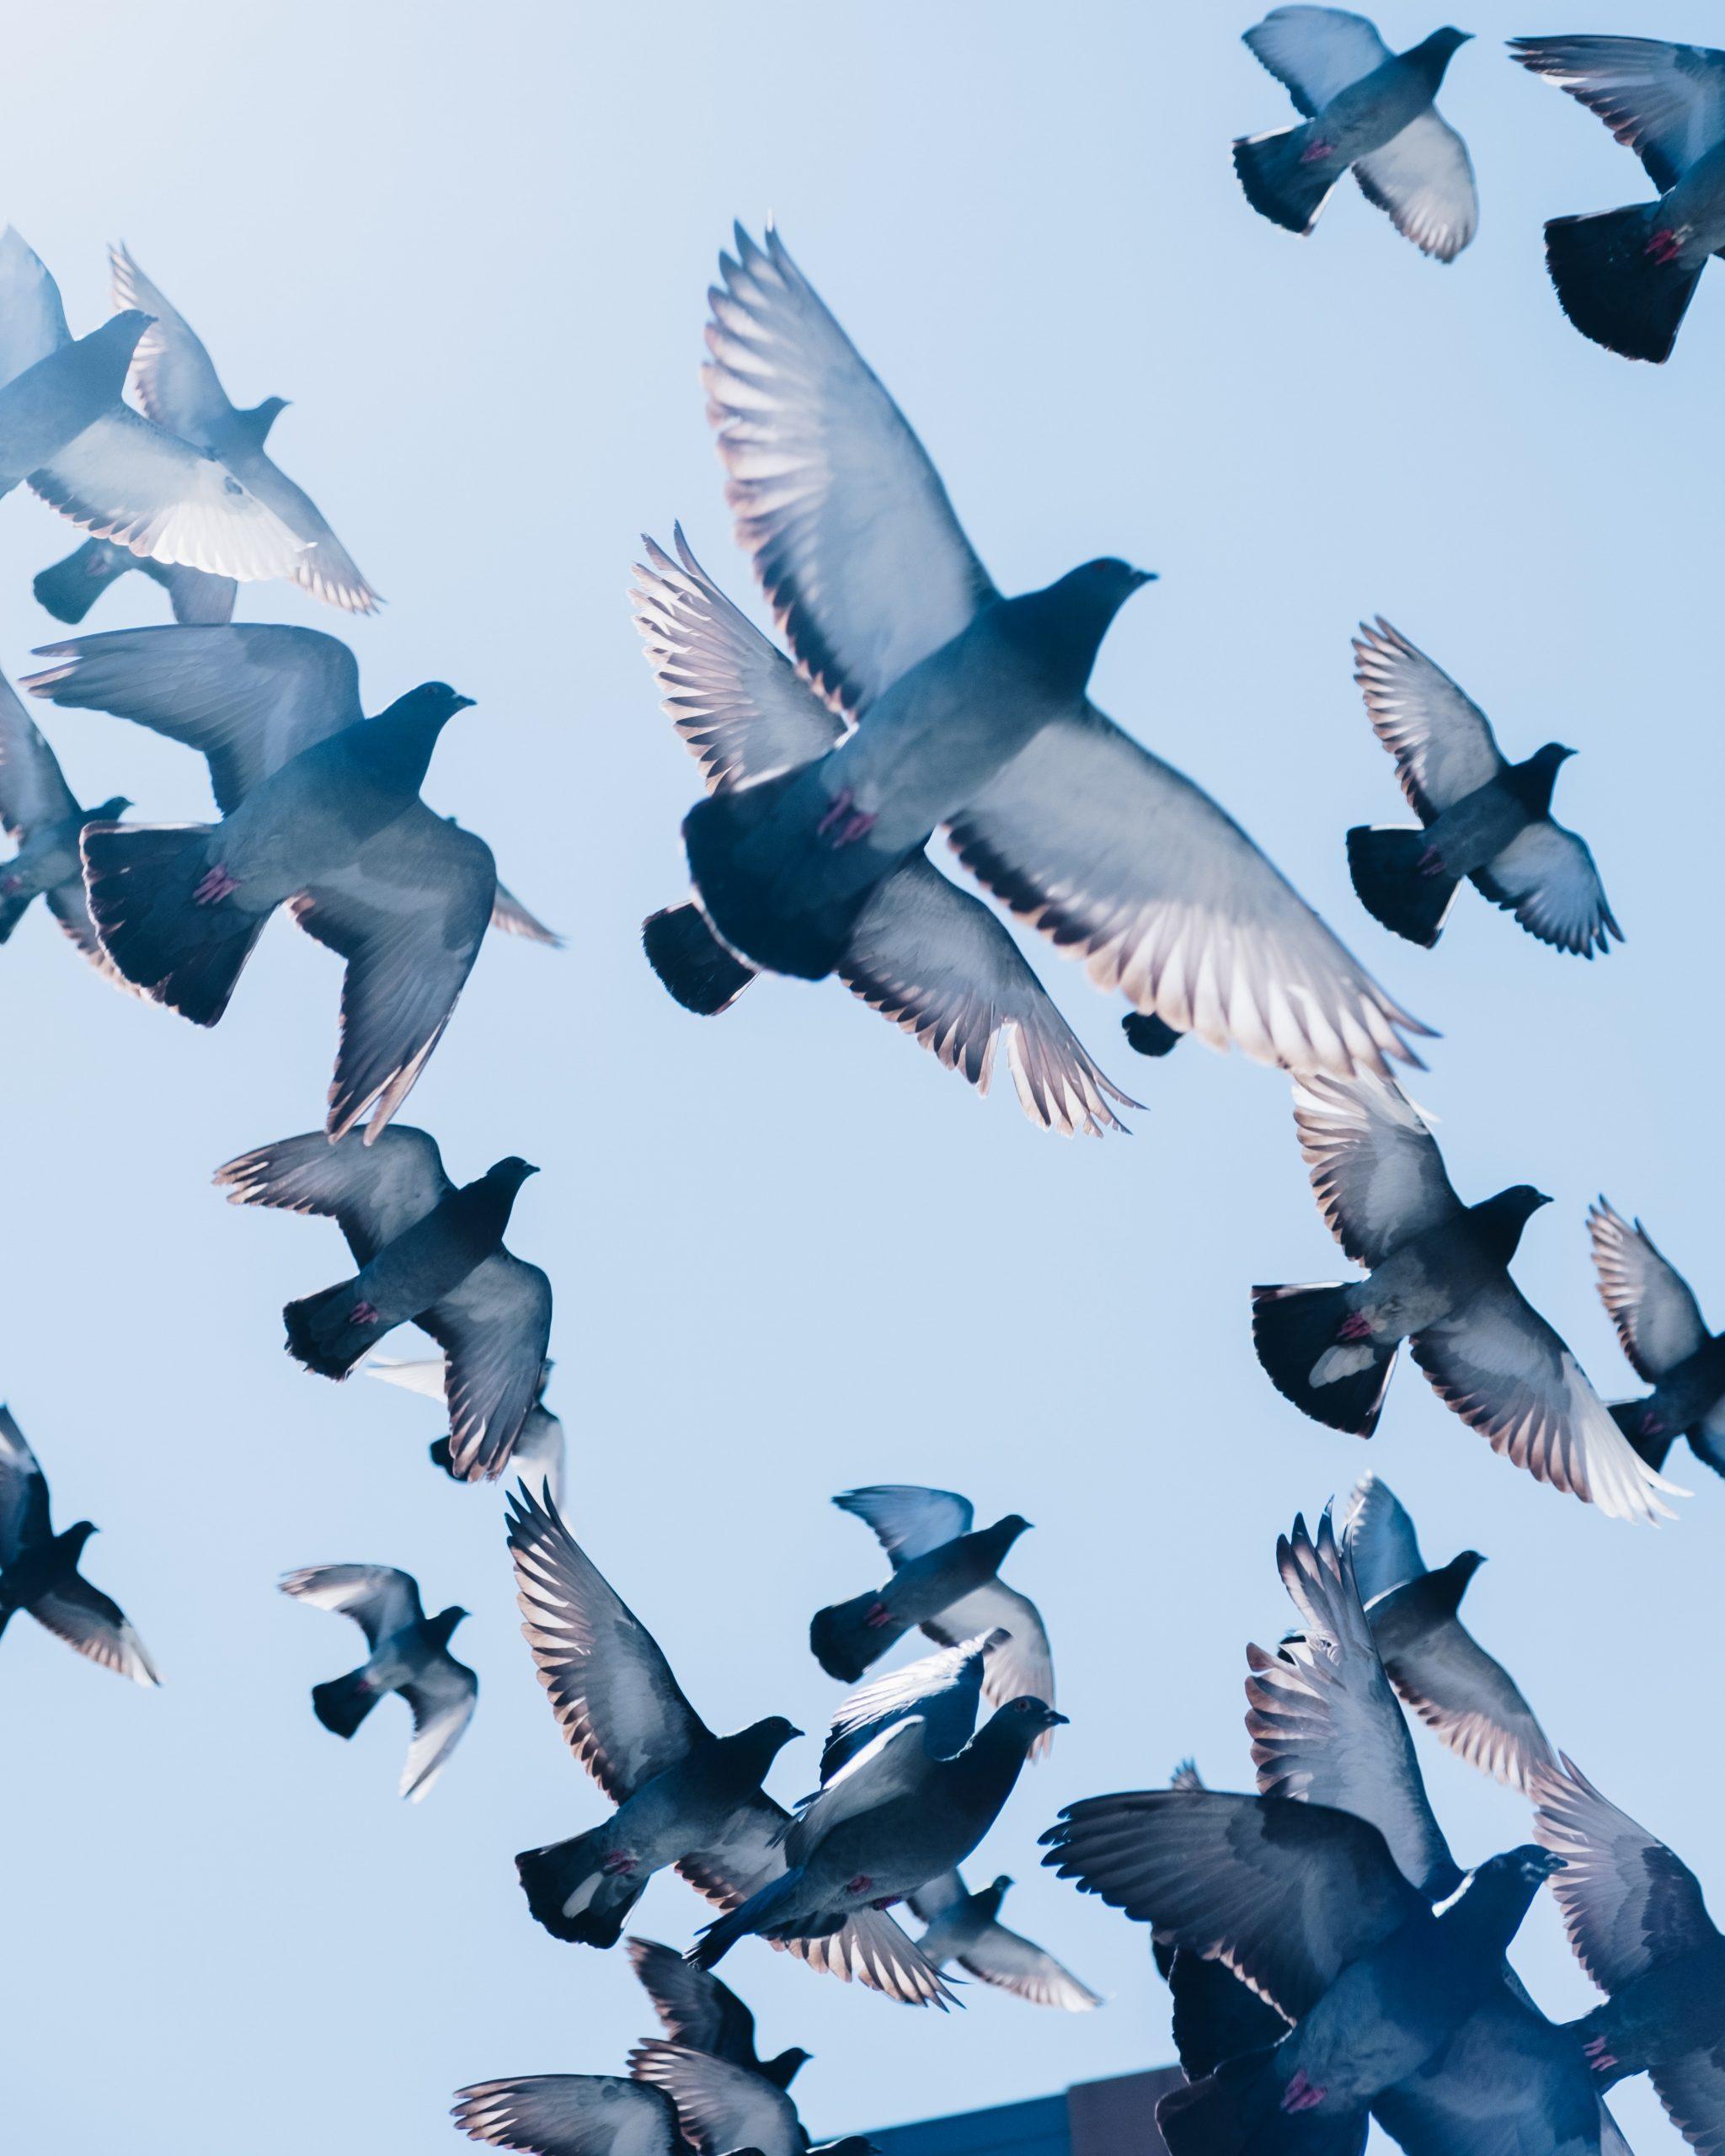 Flock of Pigeon